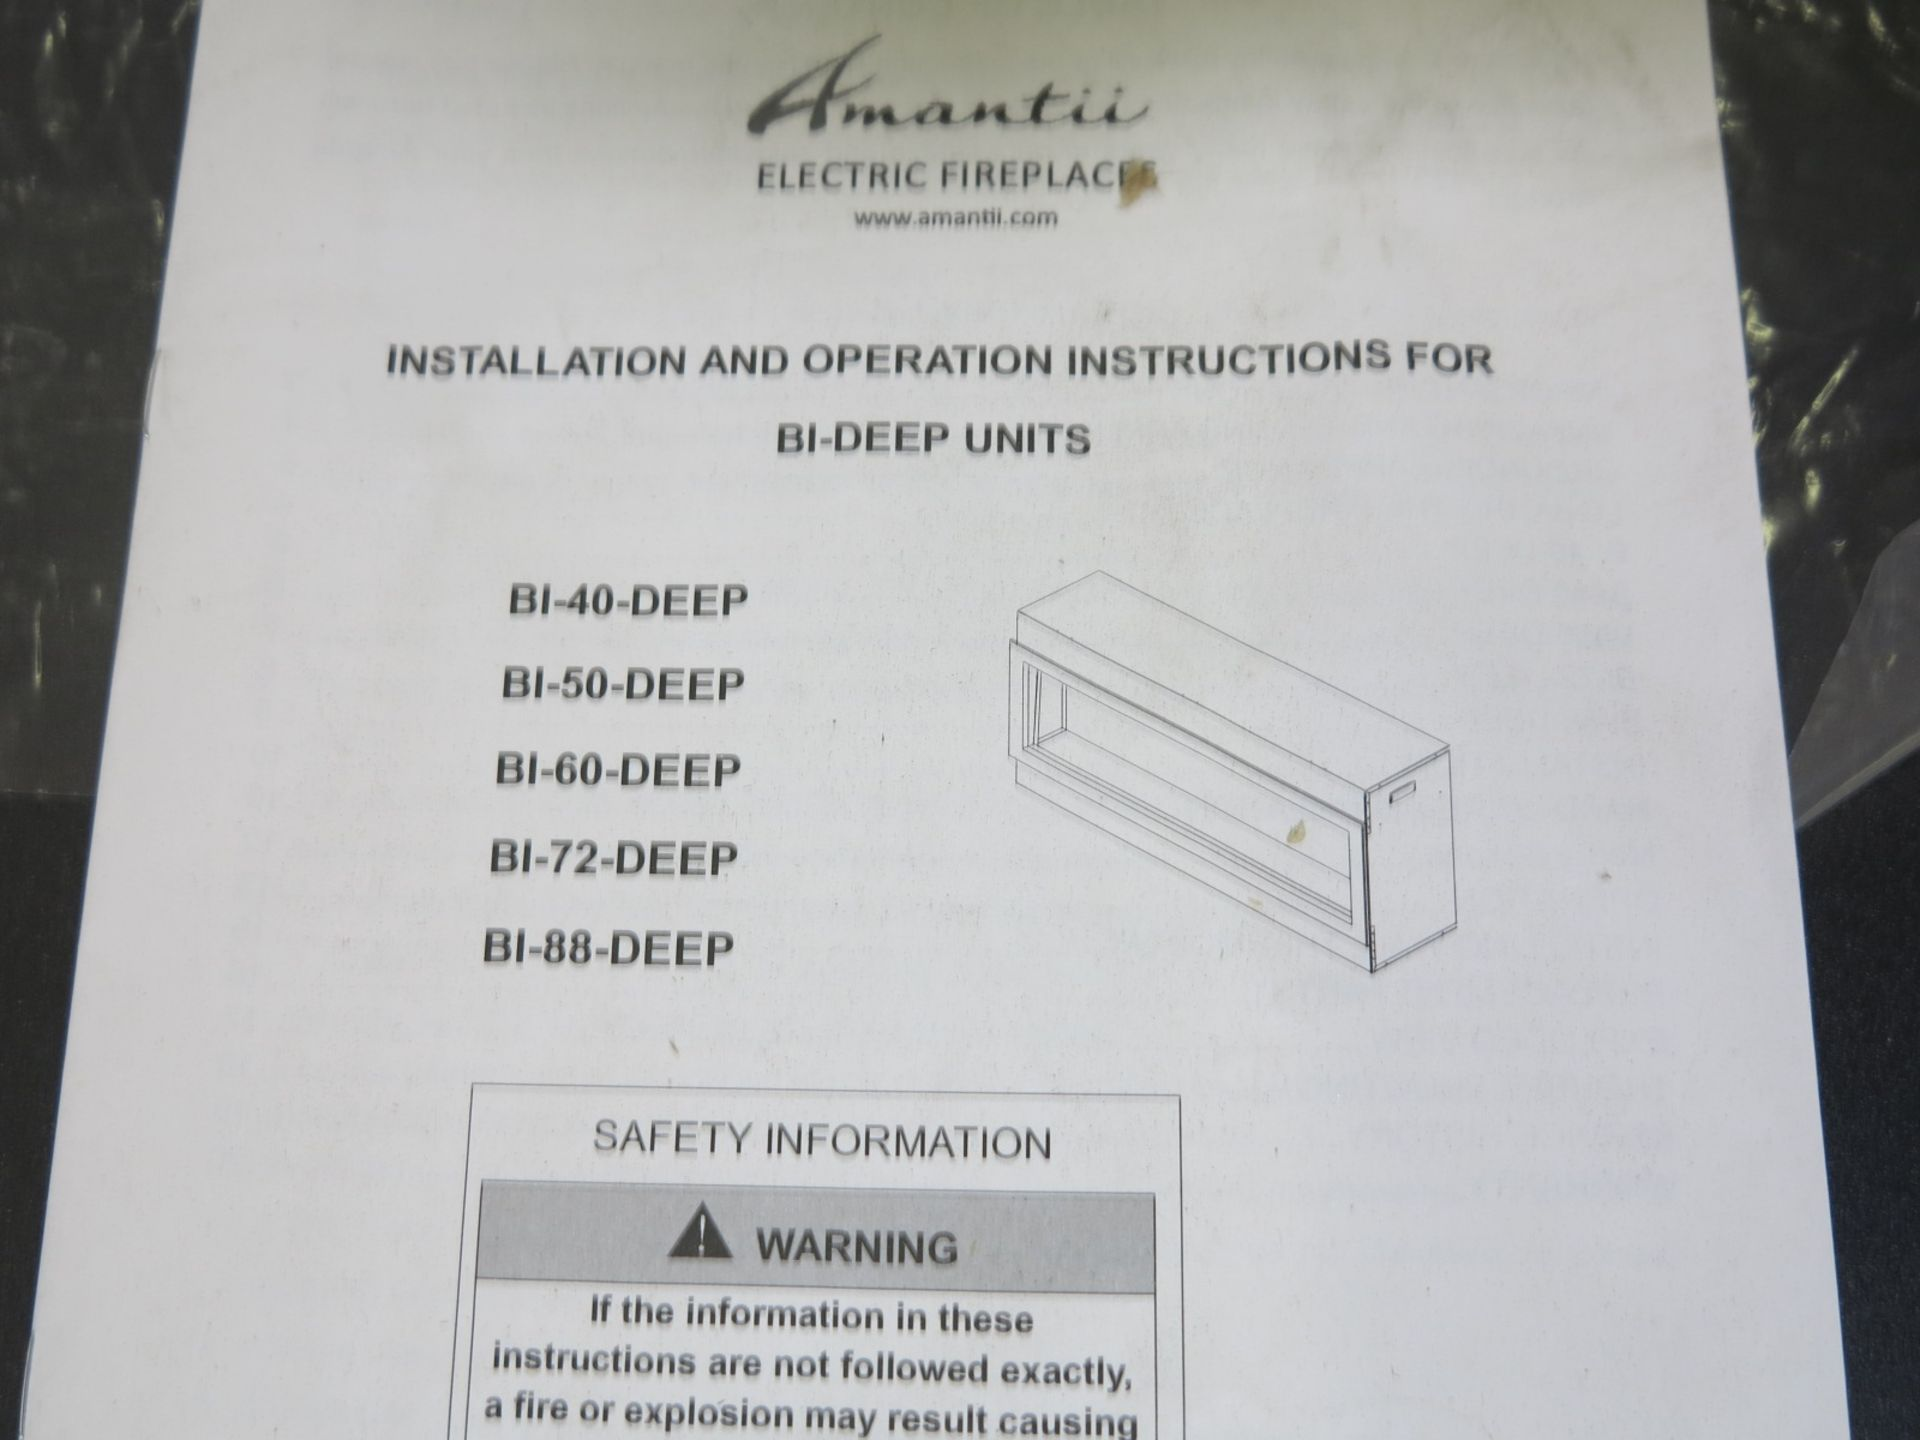 AMANTII BI-DEEP ELECTRIC FIREPLACE INSERT, MODEL BI50-DEEP - Image 2 of 2